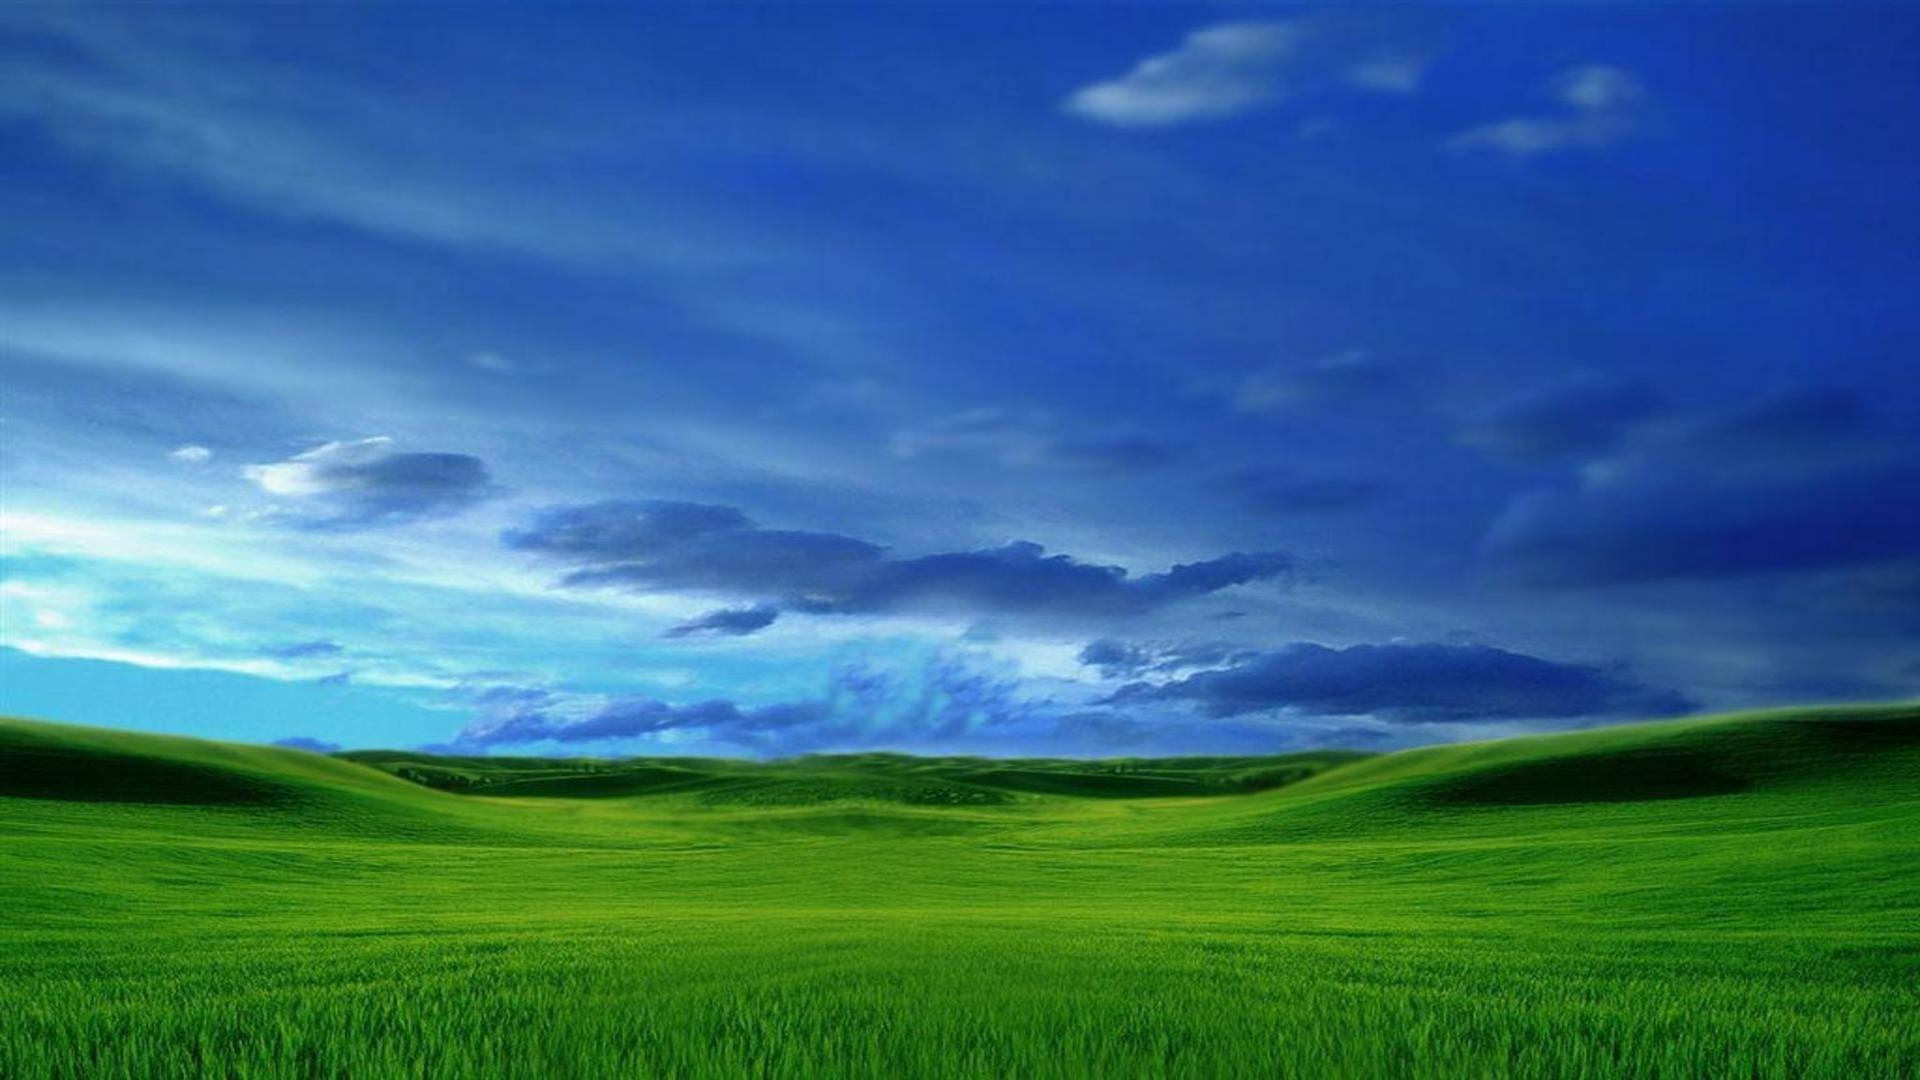 Windows Vista Desktop Wallpaper Slideshow (49+ images)